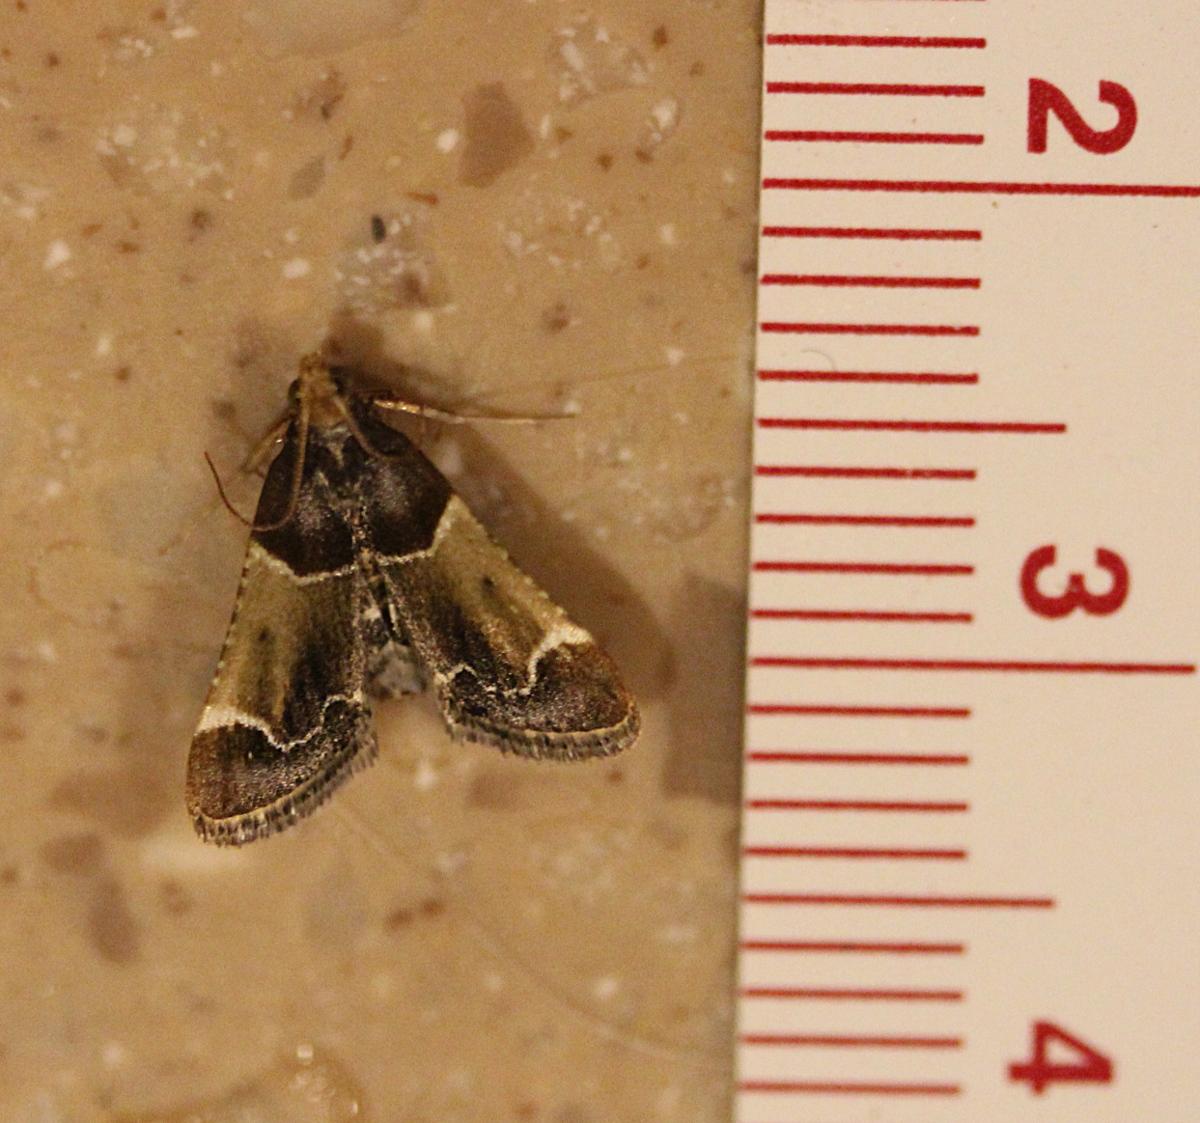 Meal Moth (Pyralis farinalis) on countertop